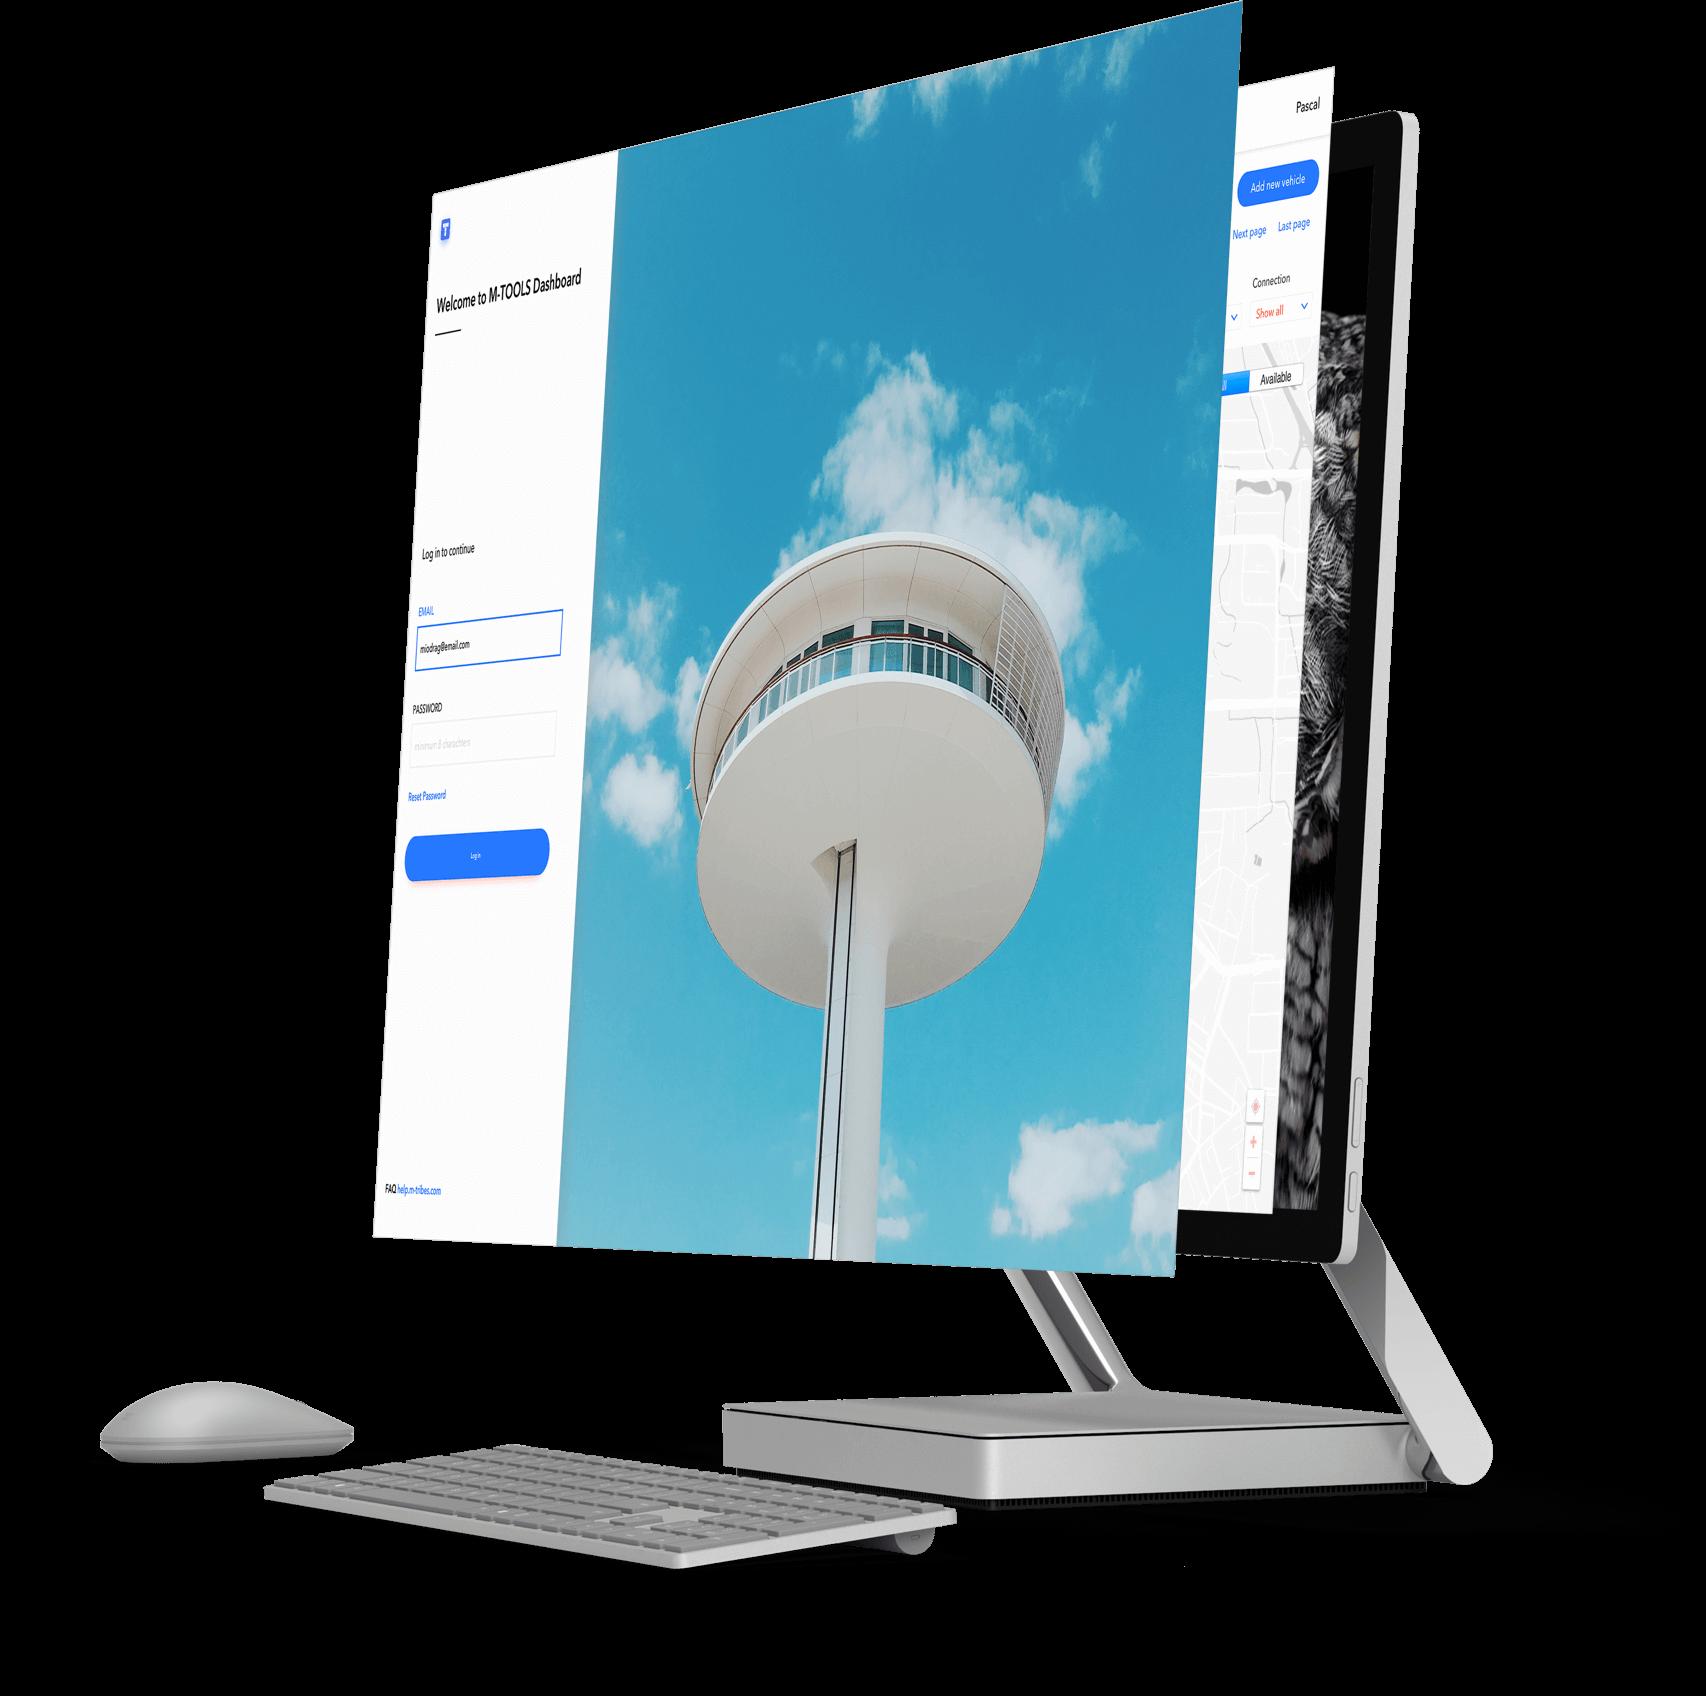 M-TOOLS technology platform web apps